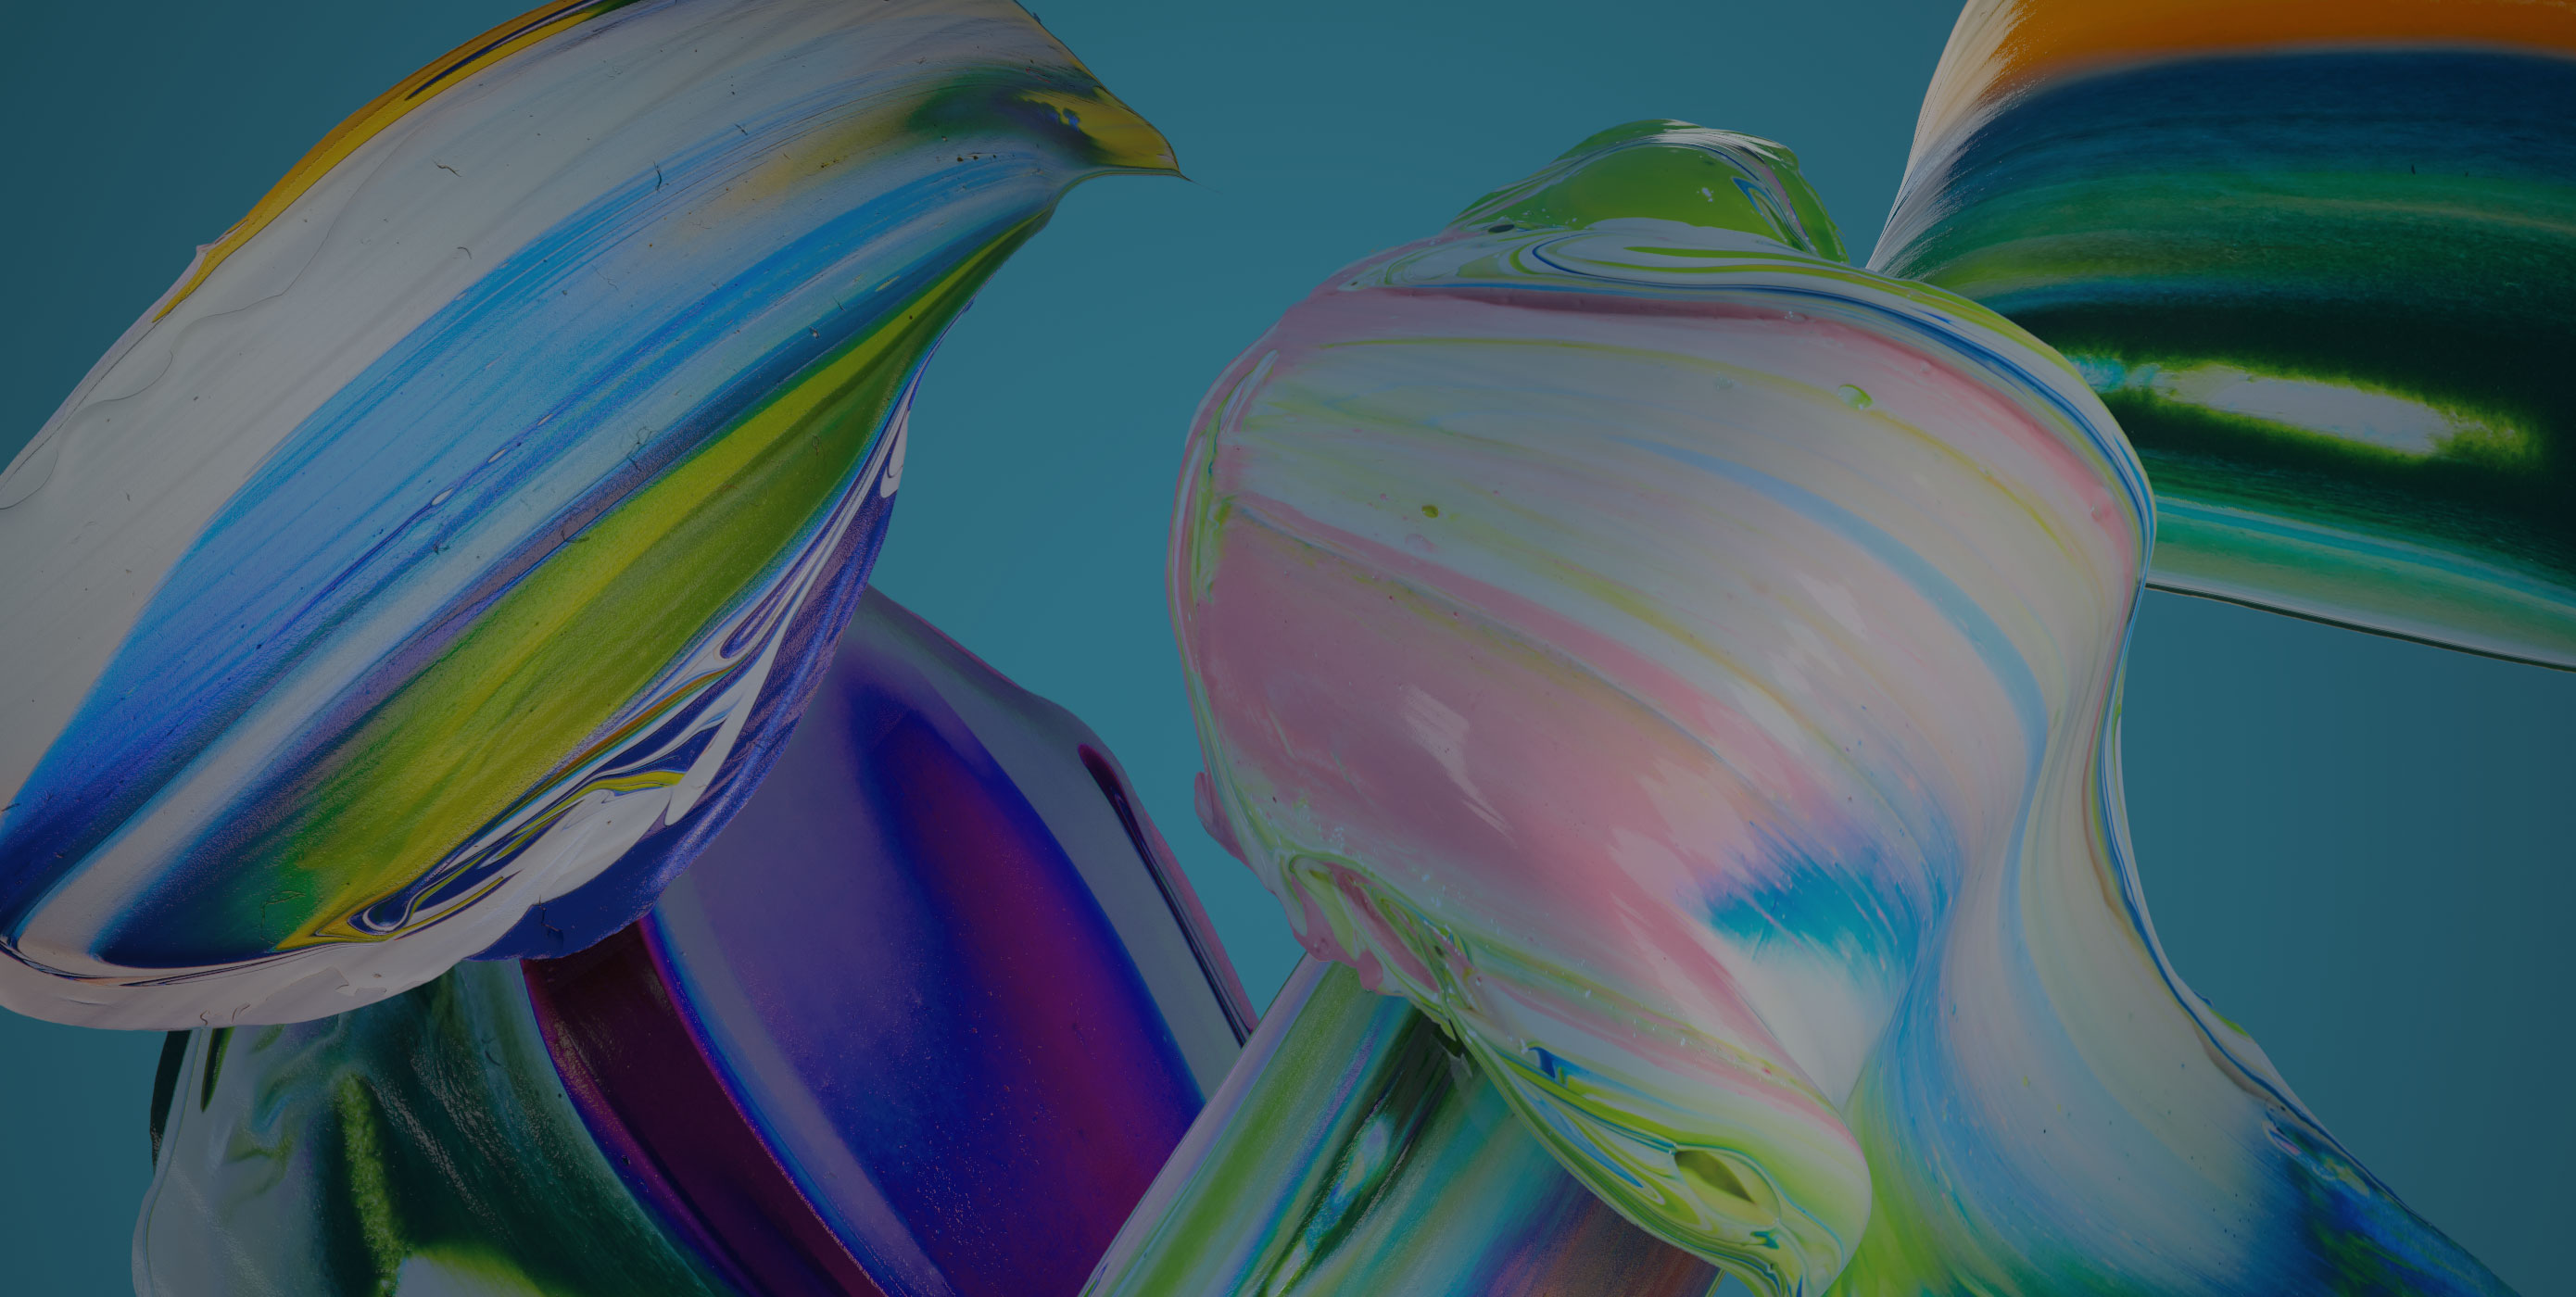 color_bg__gluvmsph8ymy_large_2x